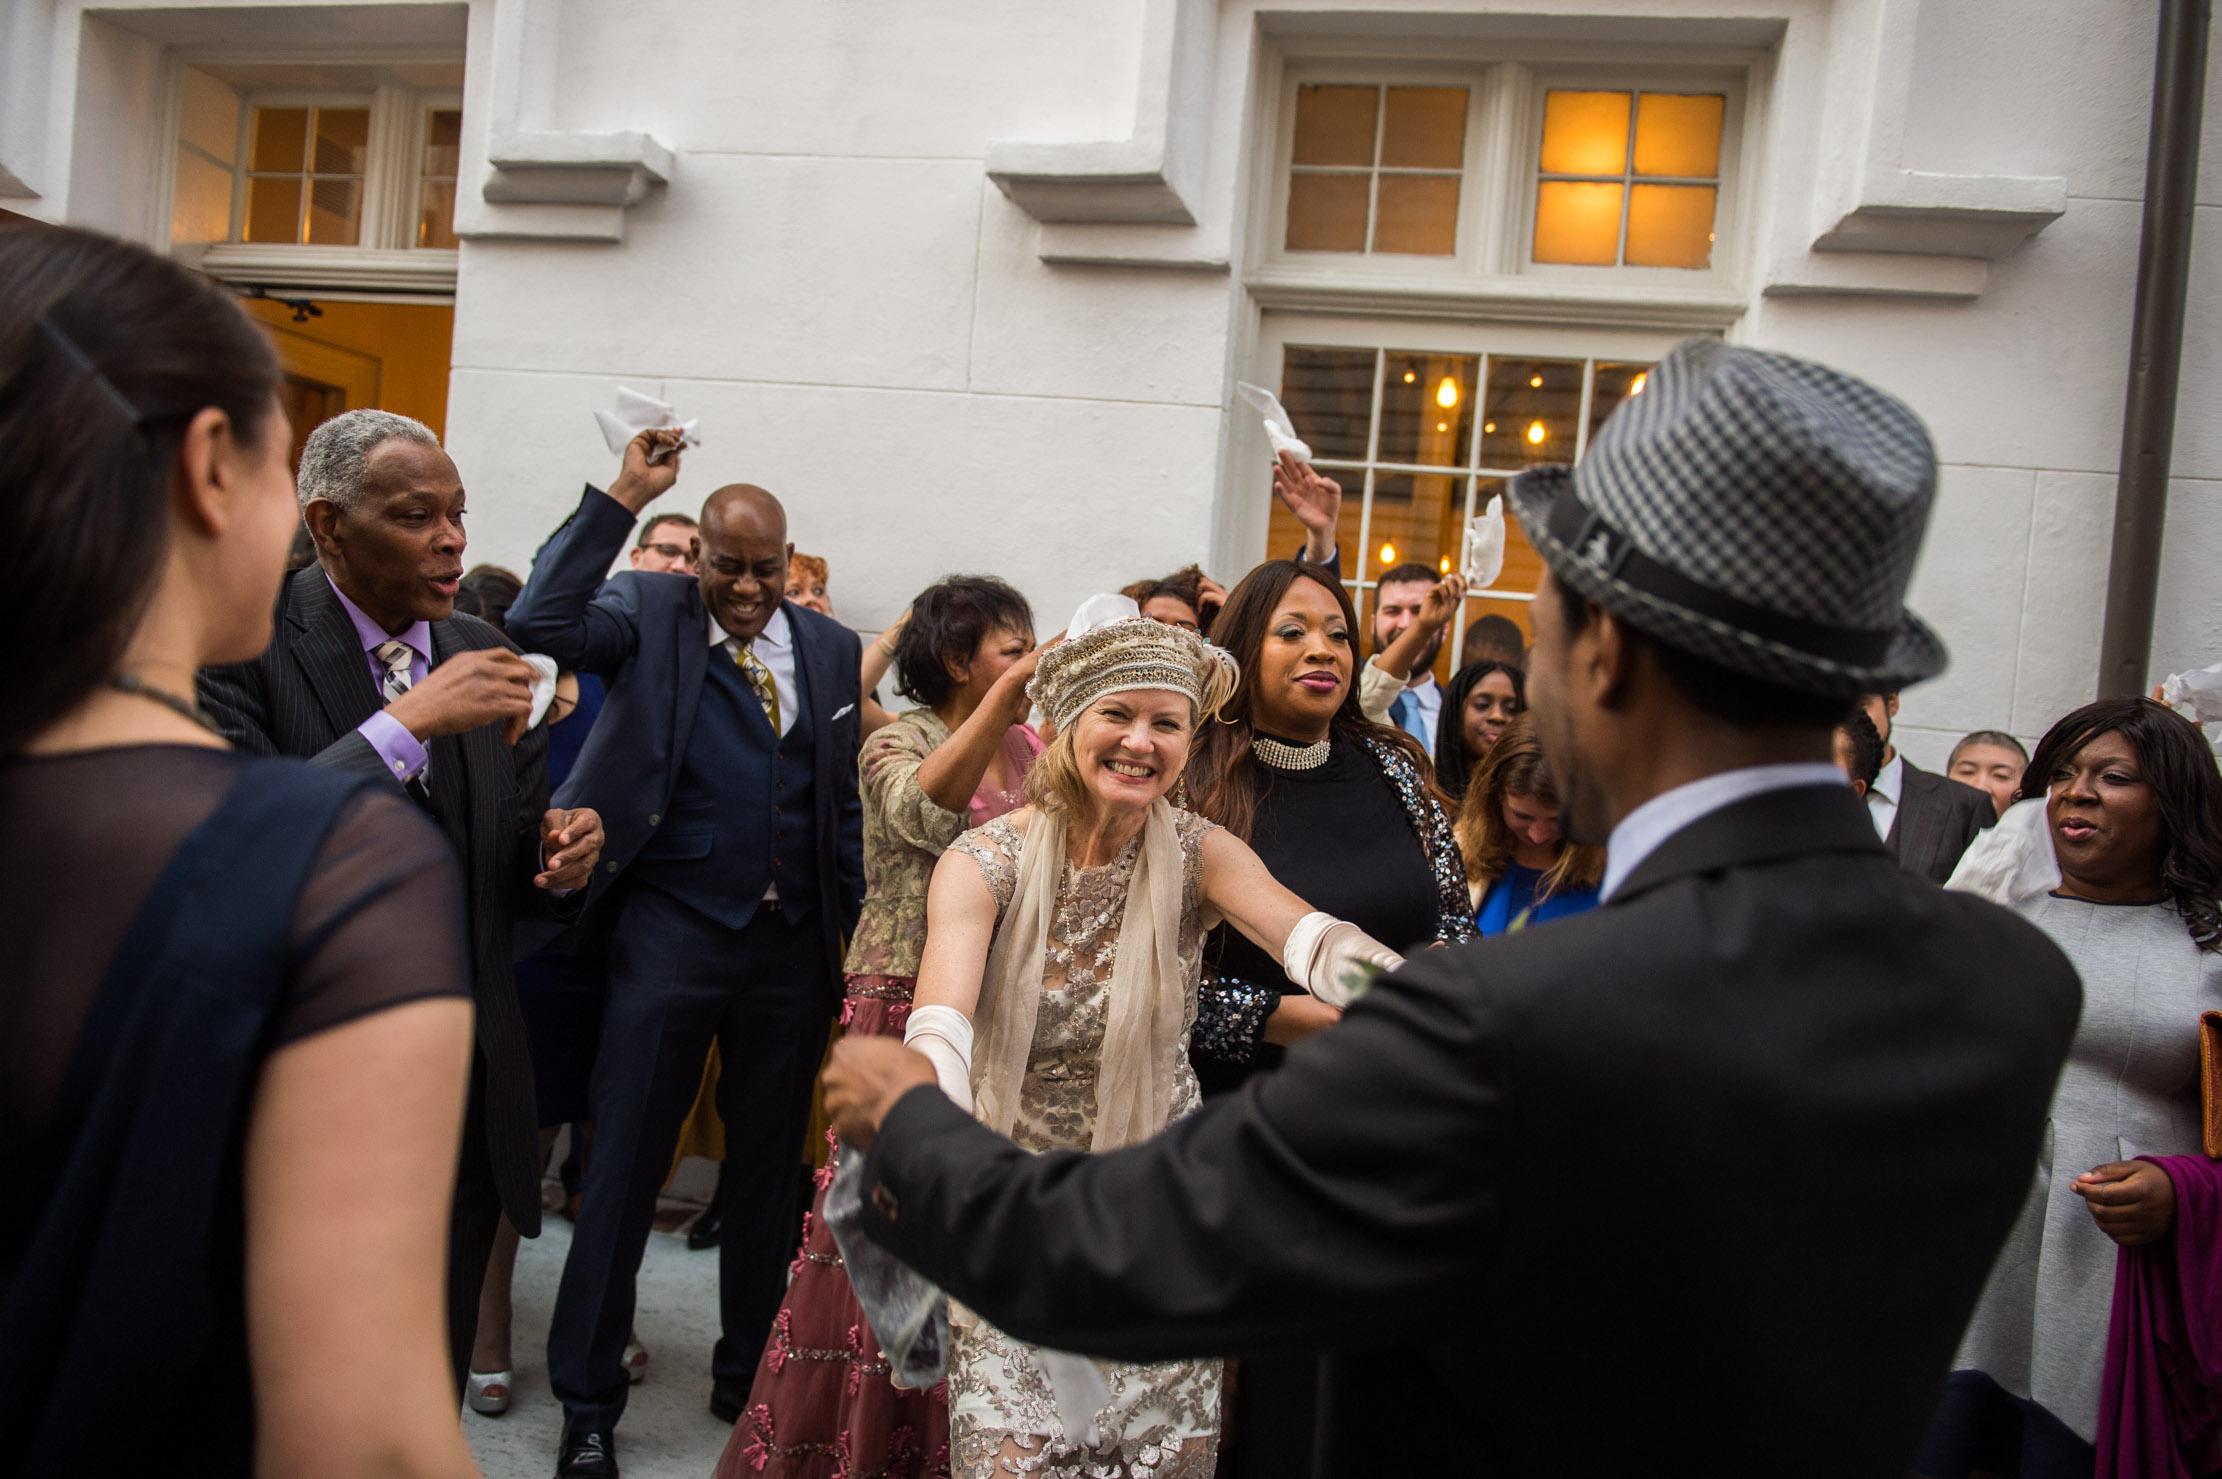 NOLA-Felicity-Church-Ace-Hotel-Wedding-1052.jpg